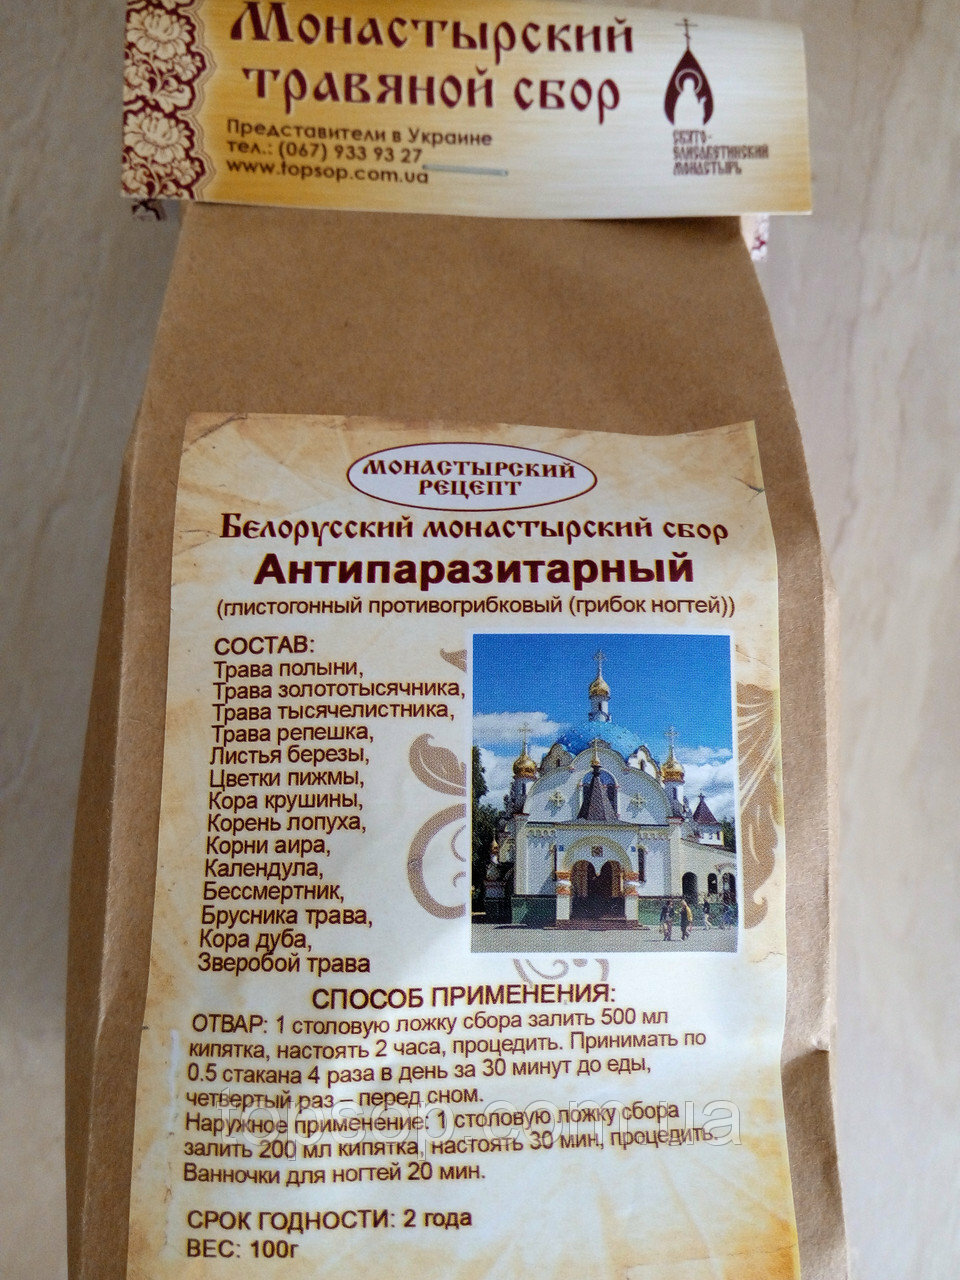 Монастырский антипаразитарный сбор в Киселёвске